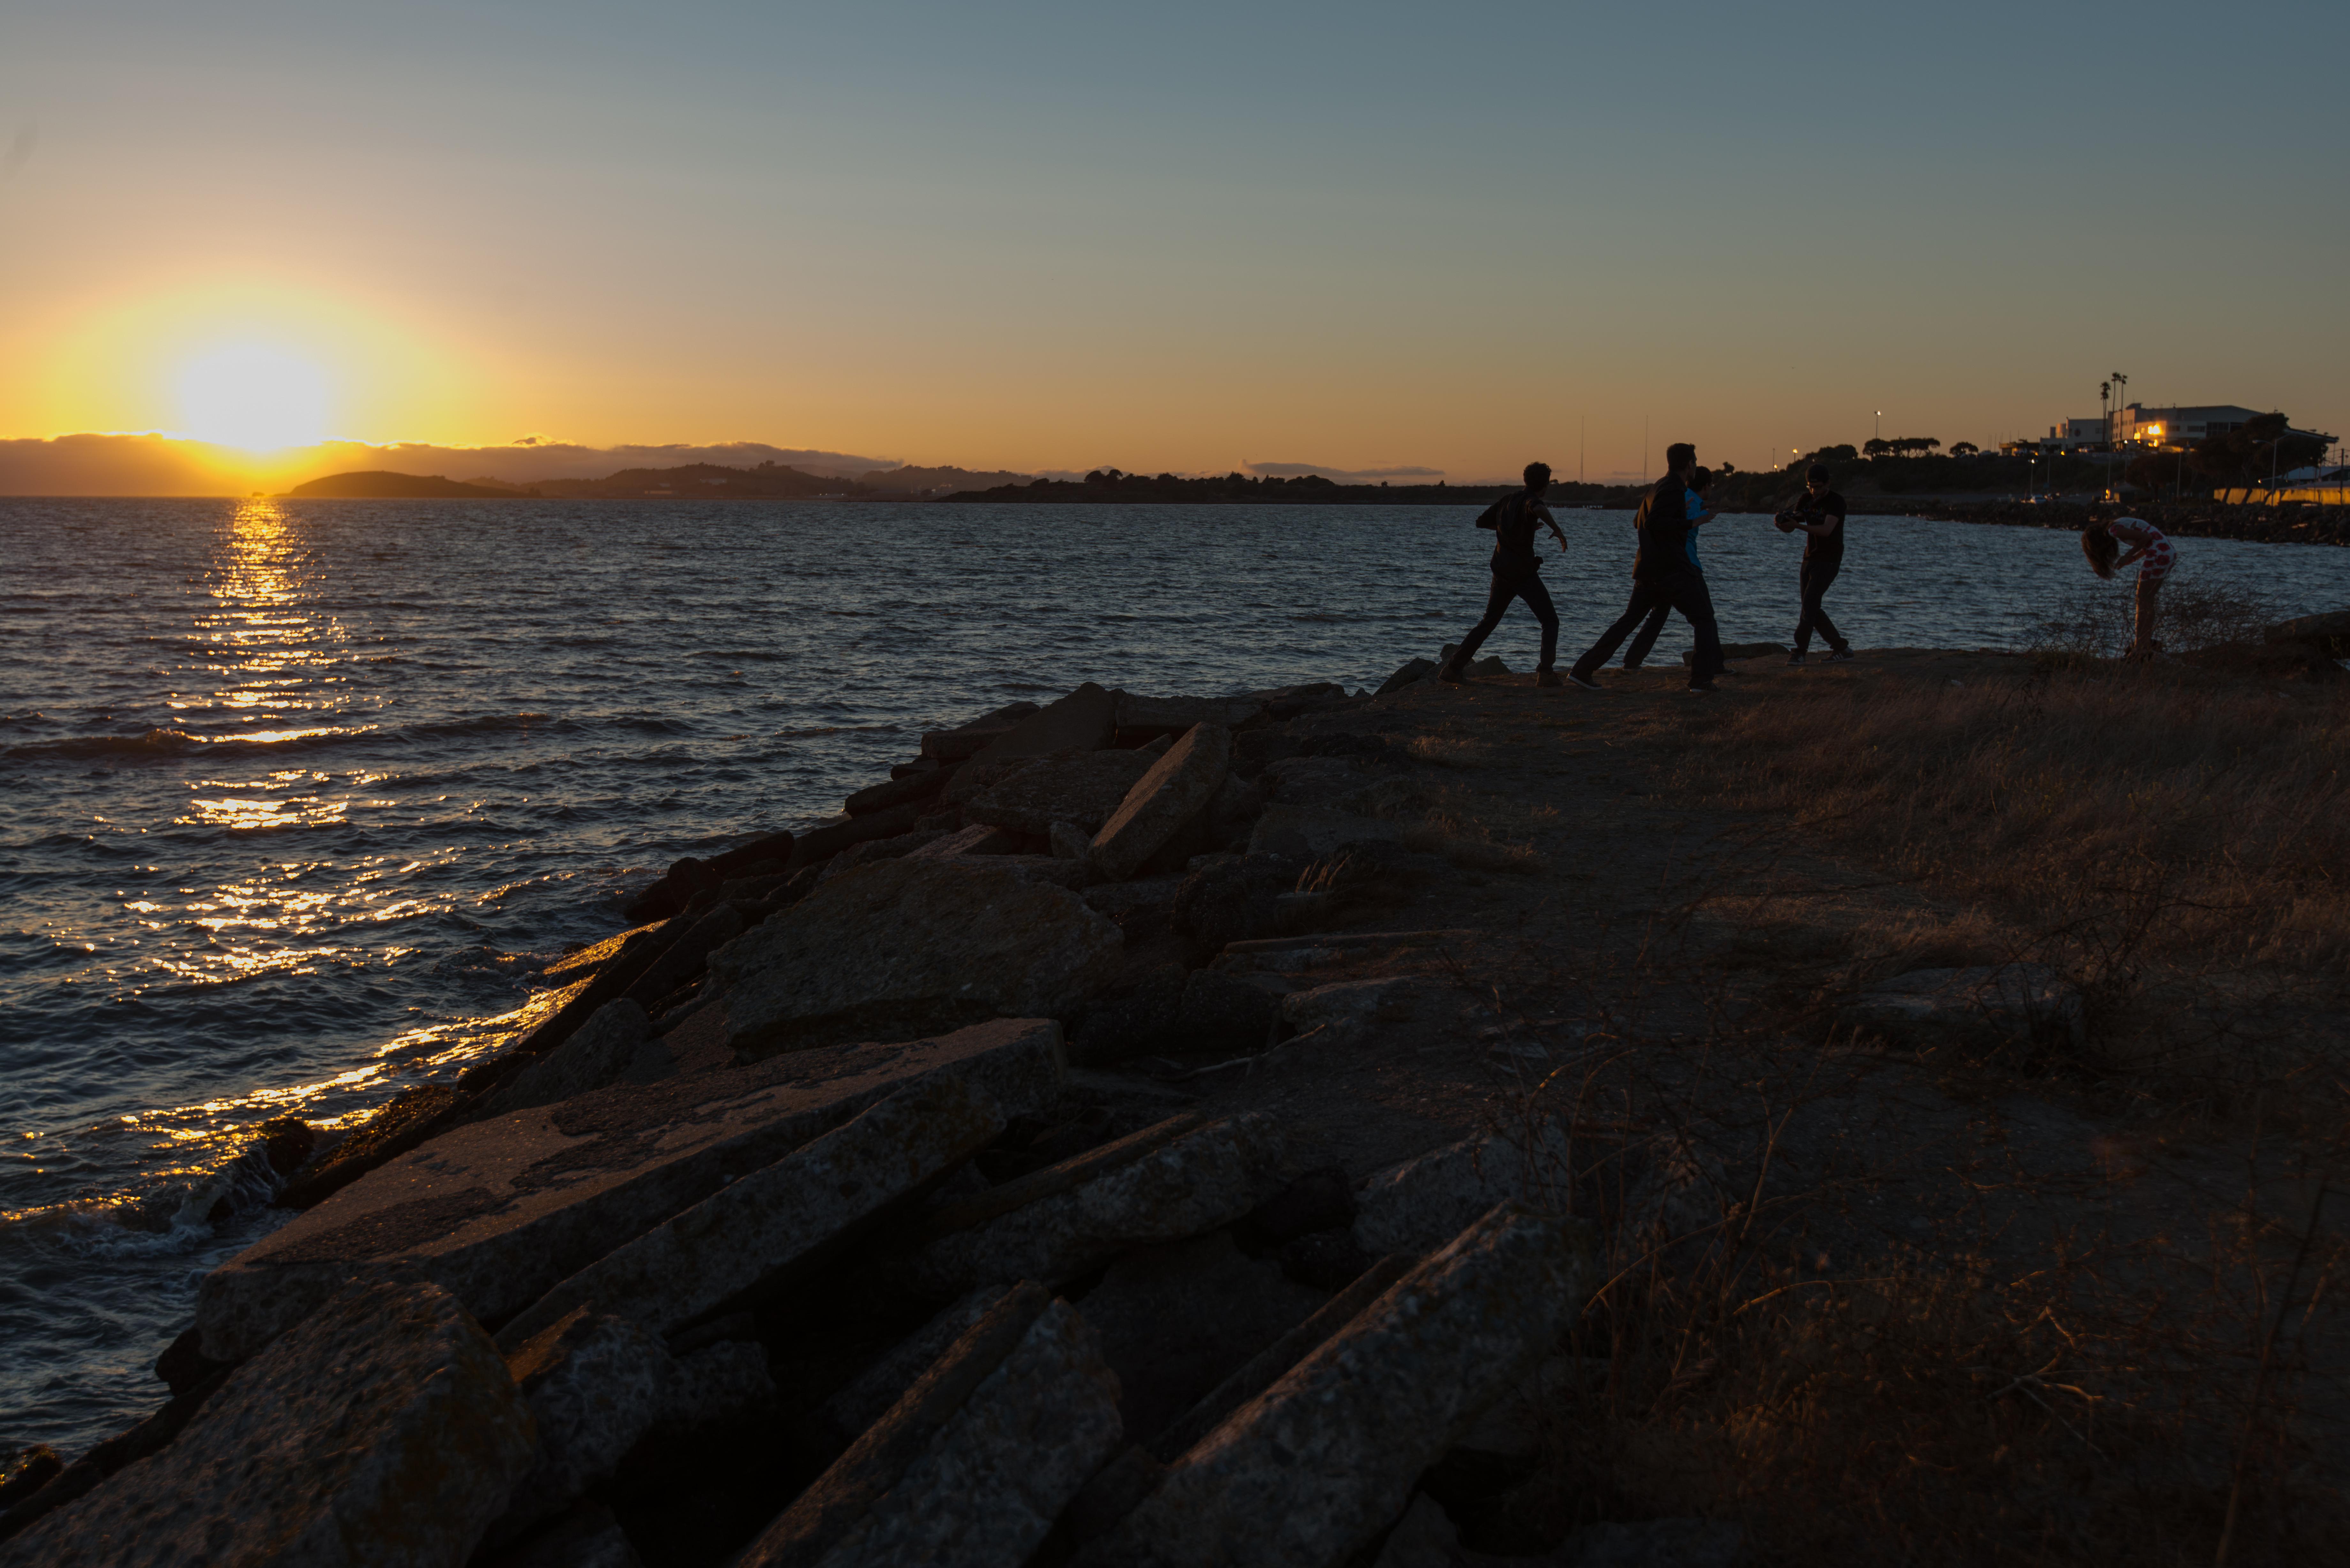 Men dancing on rocky outcrop in front of setting sun, Coast, Dusk, Landscape, Ocean, HQ Photo